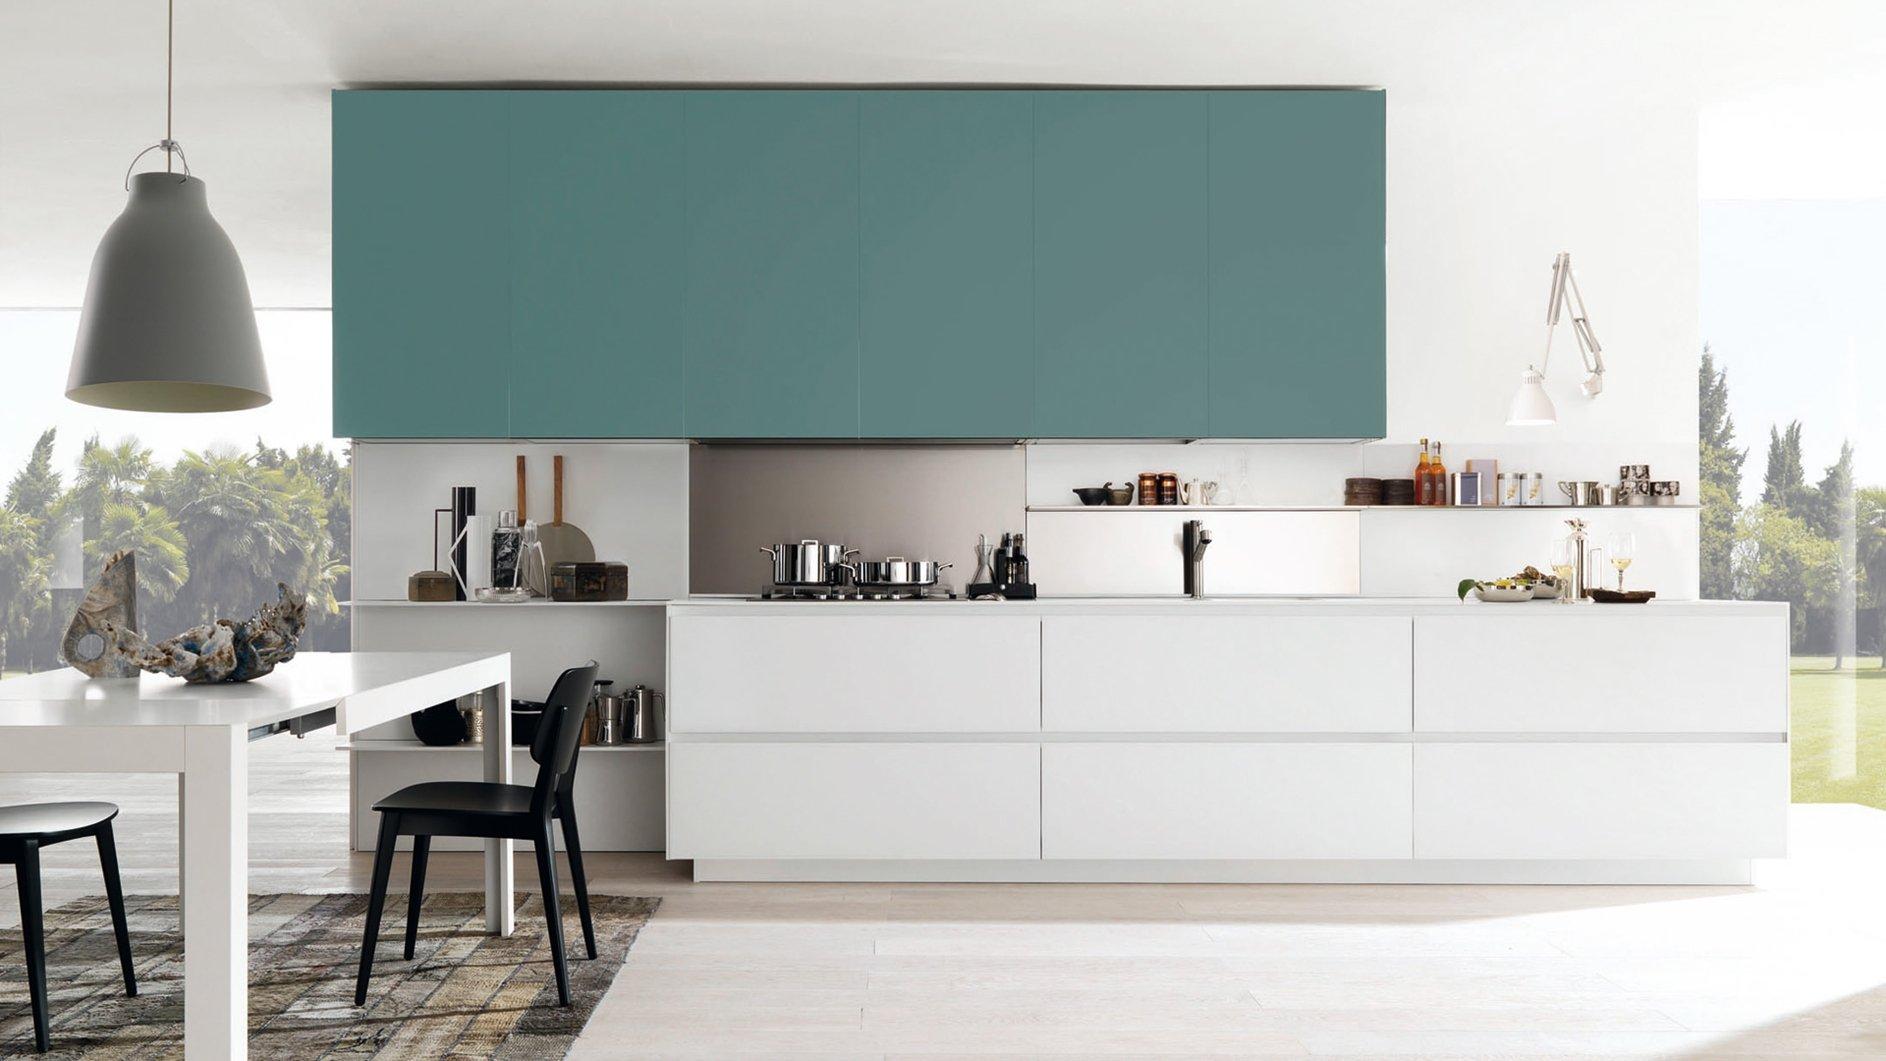 Cucine Ikea Opinione : Cucine ikea opinioni 2014. Cucine ikea ...